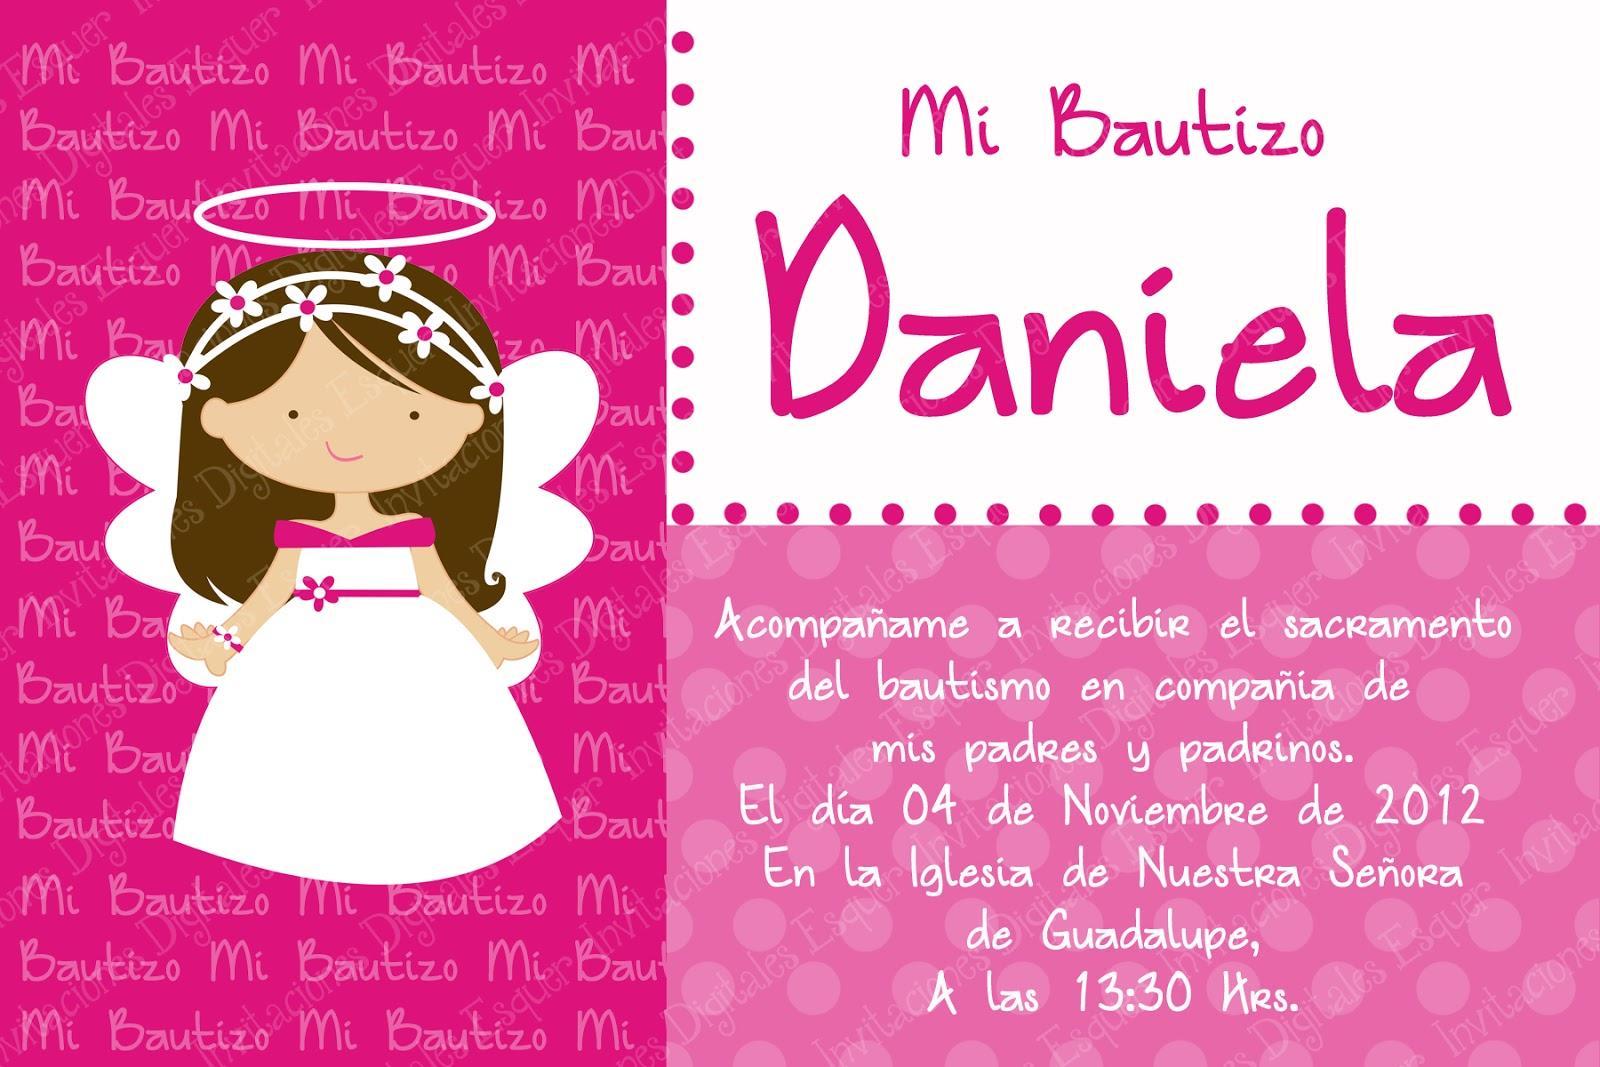 Invitaciones Digitales Esquer: Bautizo